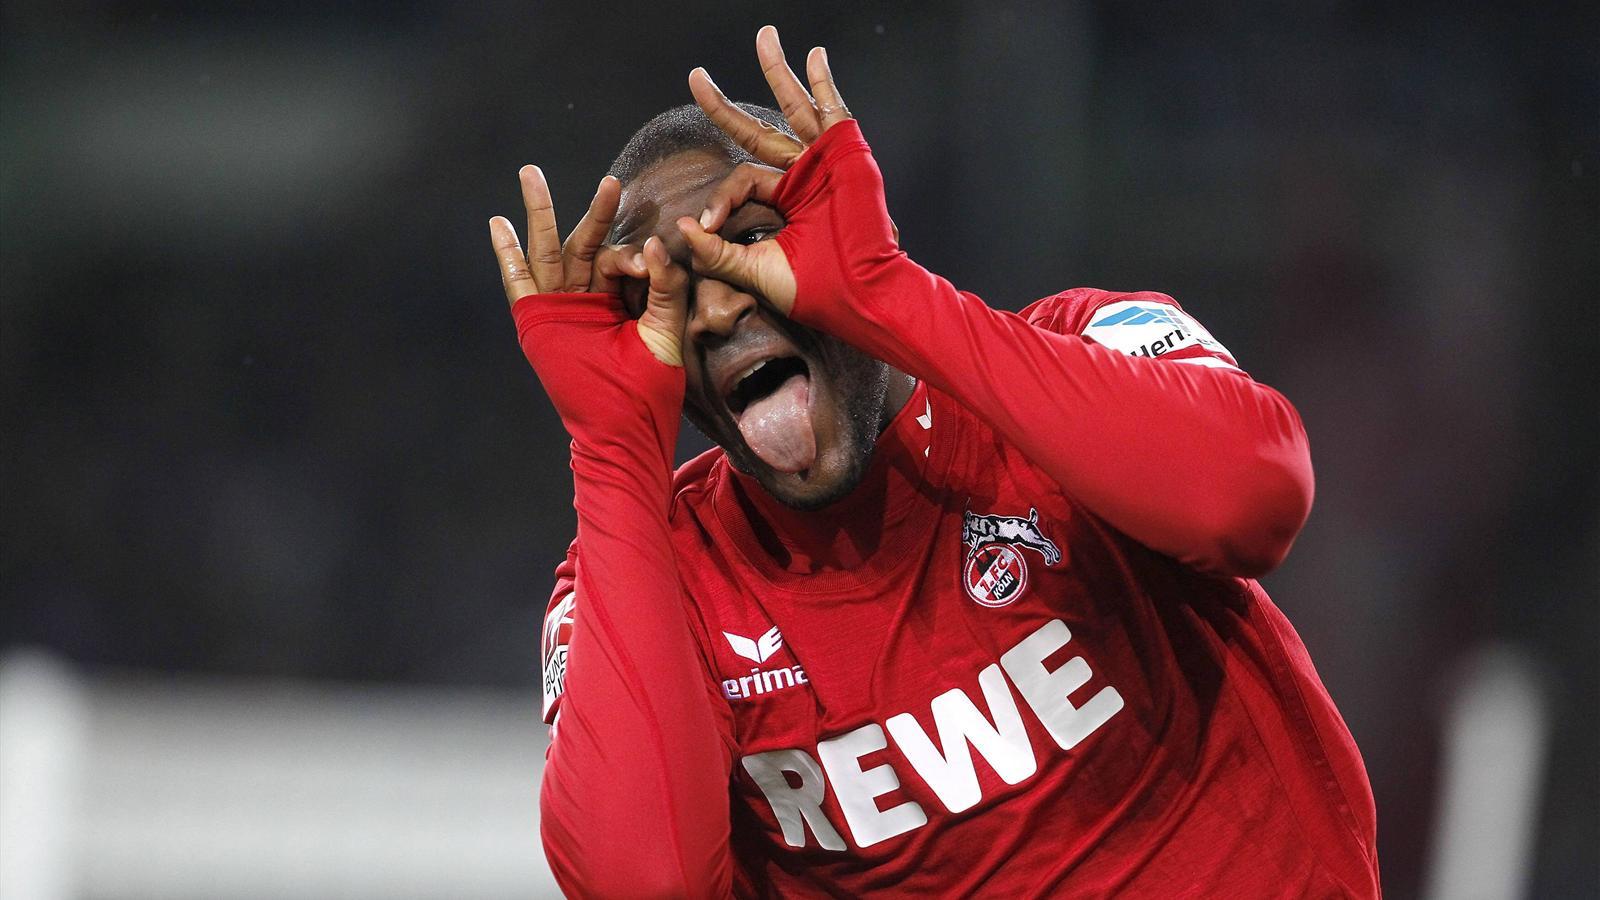 ... revient sur le podium - Bundesliga 2016-2017 - Football - Eurosport